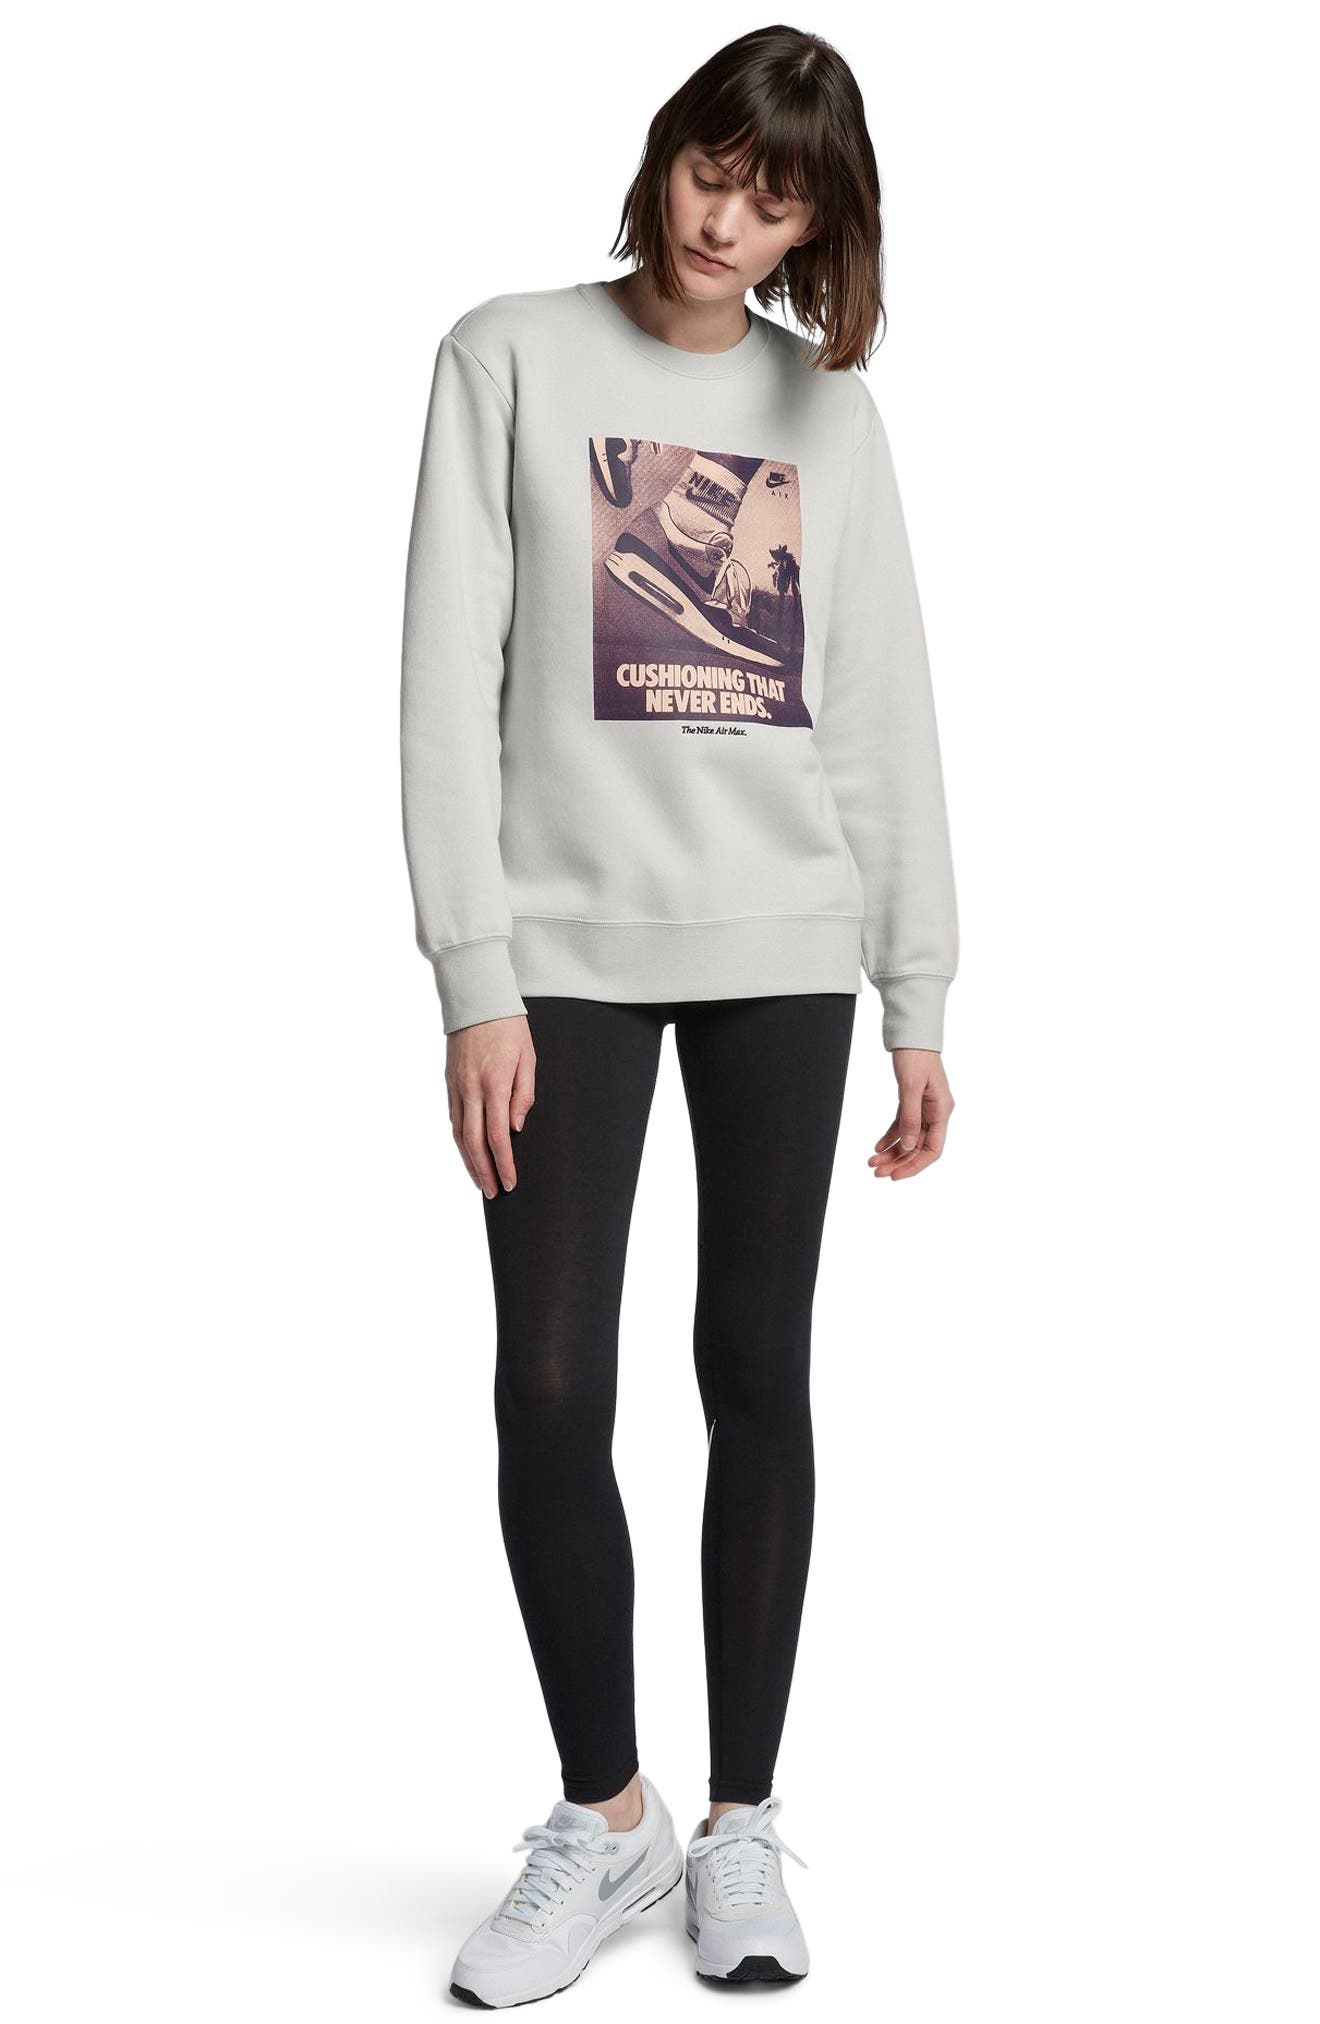 Sportswear Air Max 1 Women's Graphic Crewneck Sweatshirt,                             Alternate thumbnail 4, color,                             Vast Grey